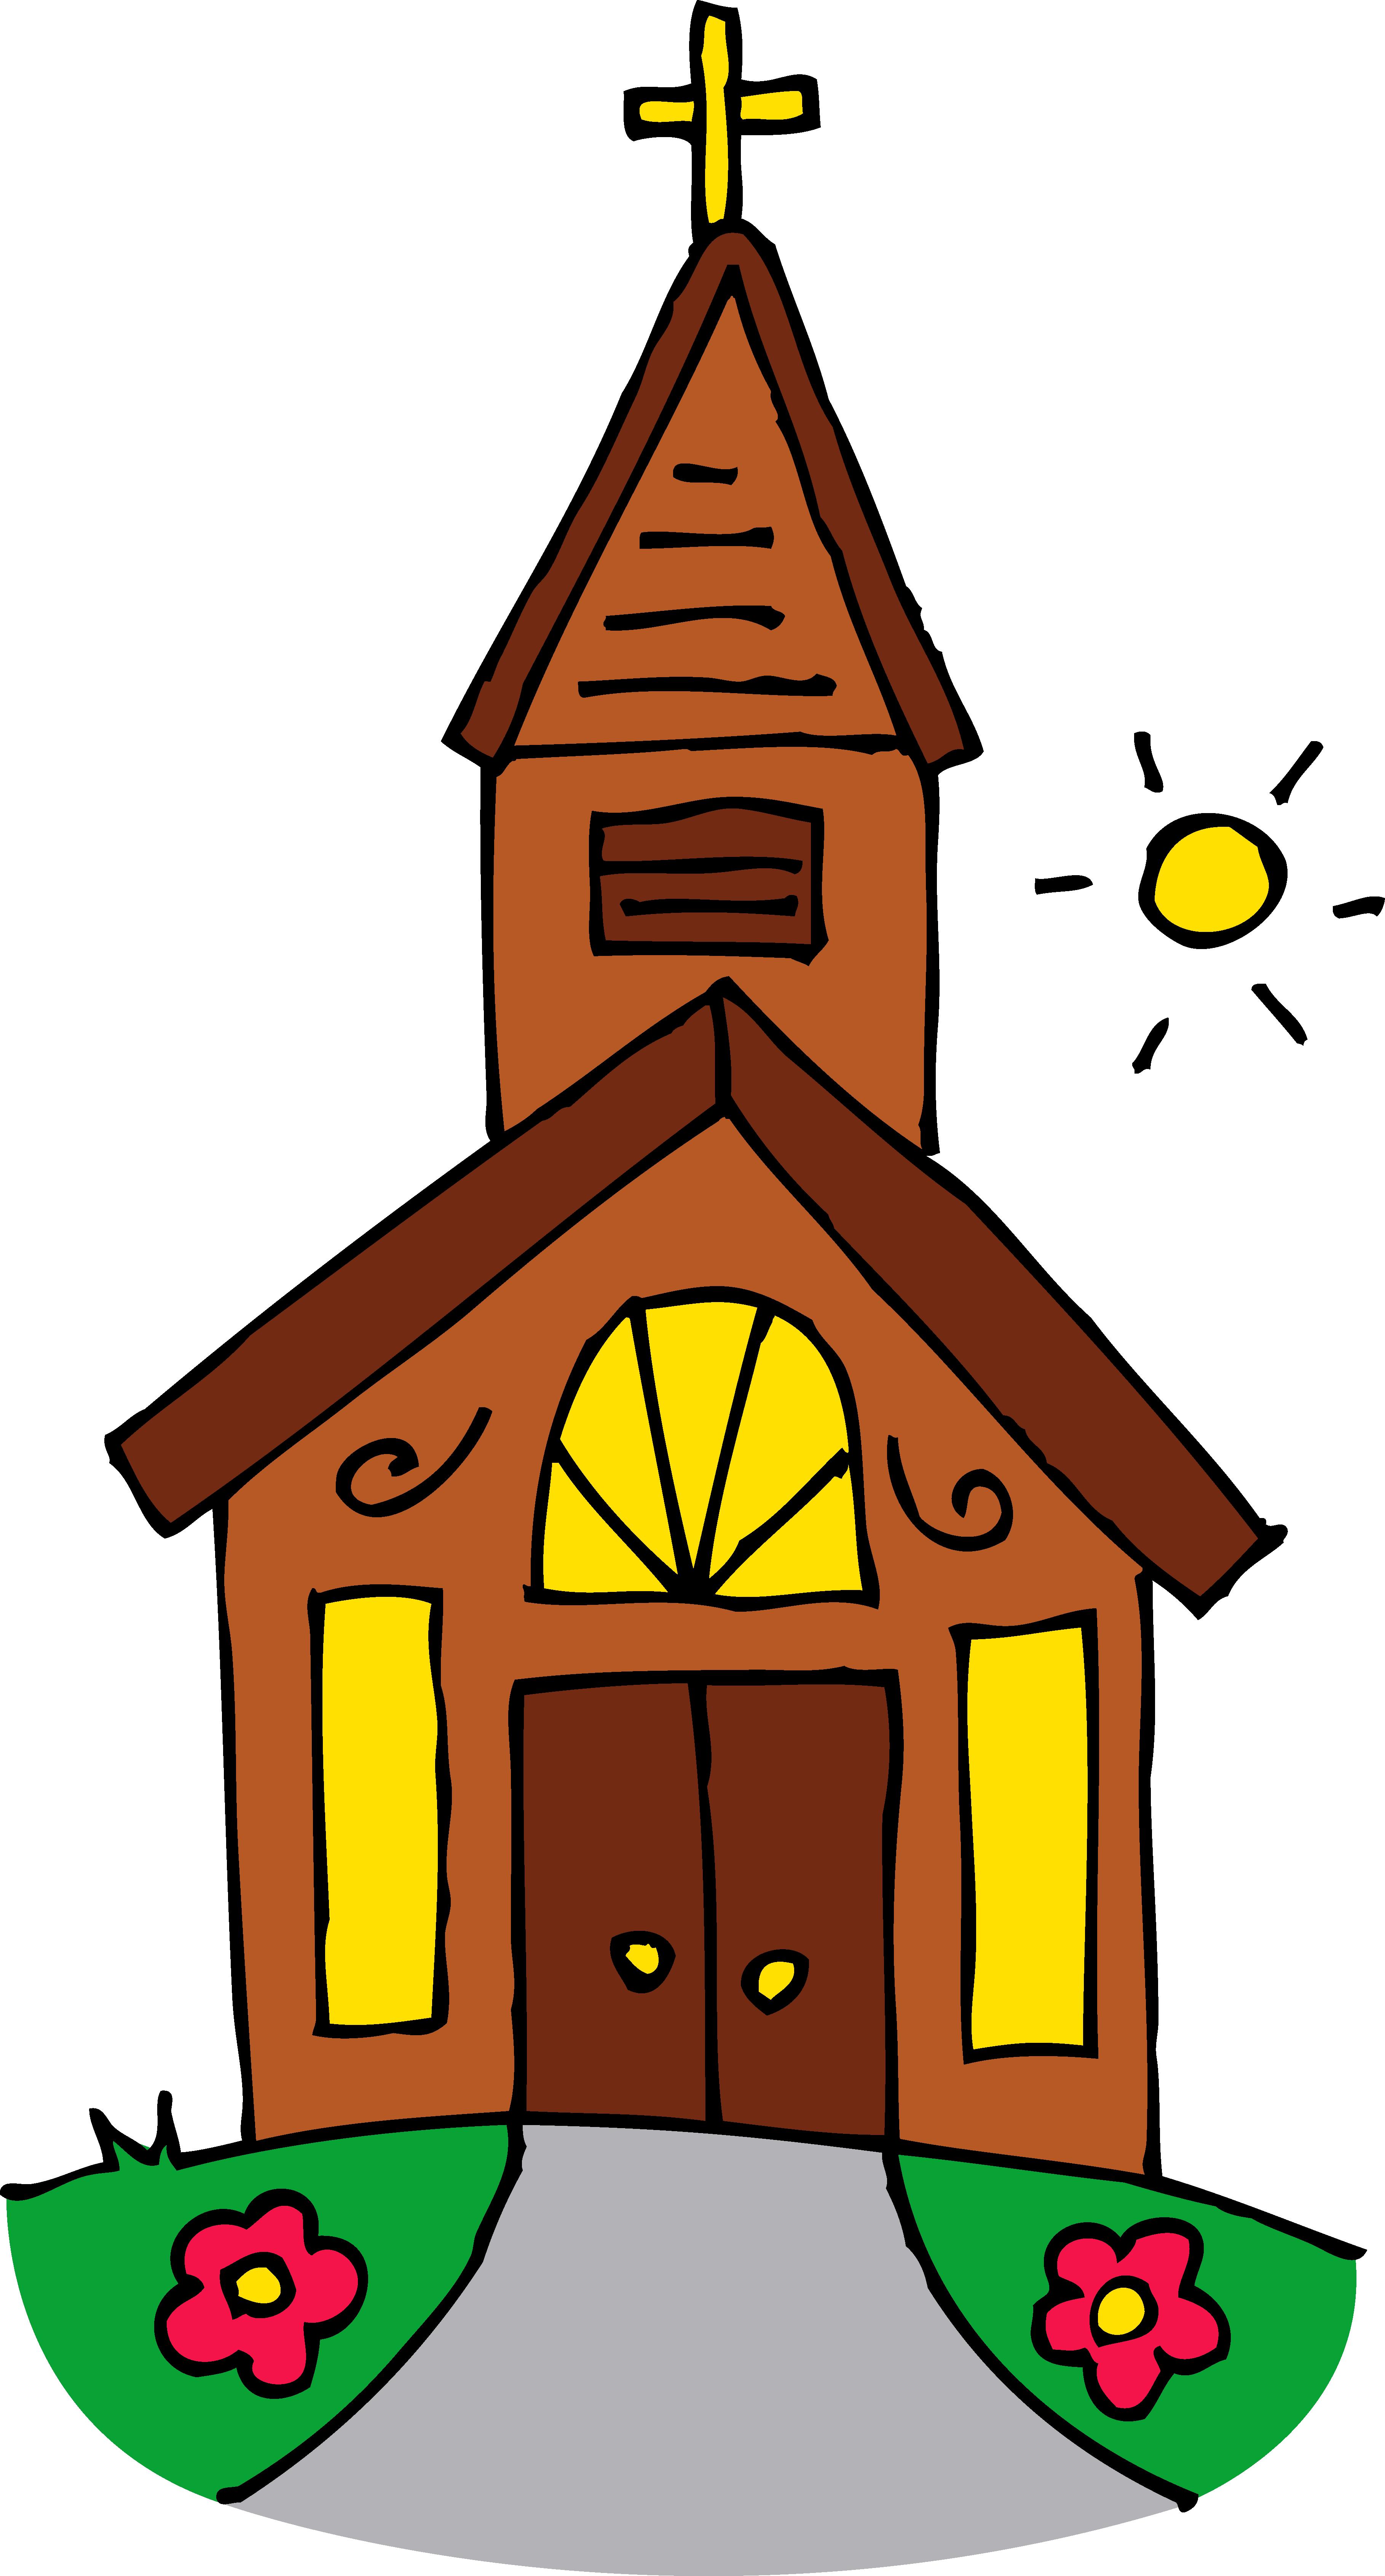 Church Clip Art - Blogsbeta-Church Clip Art - Blogsbeta-8